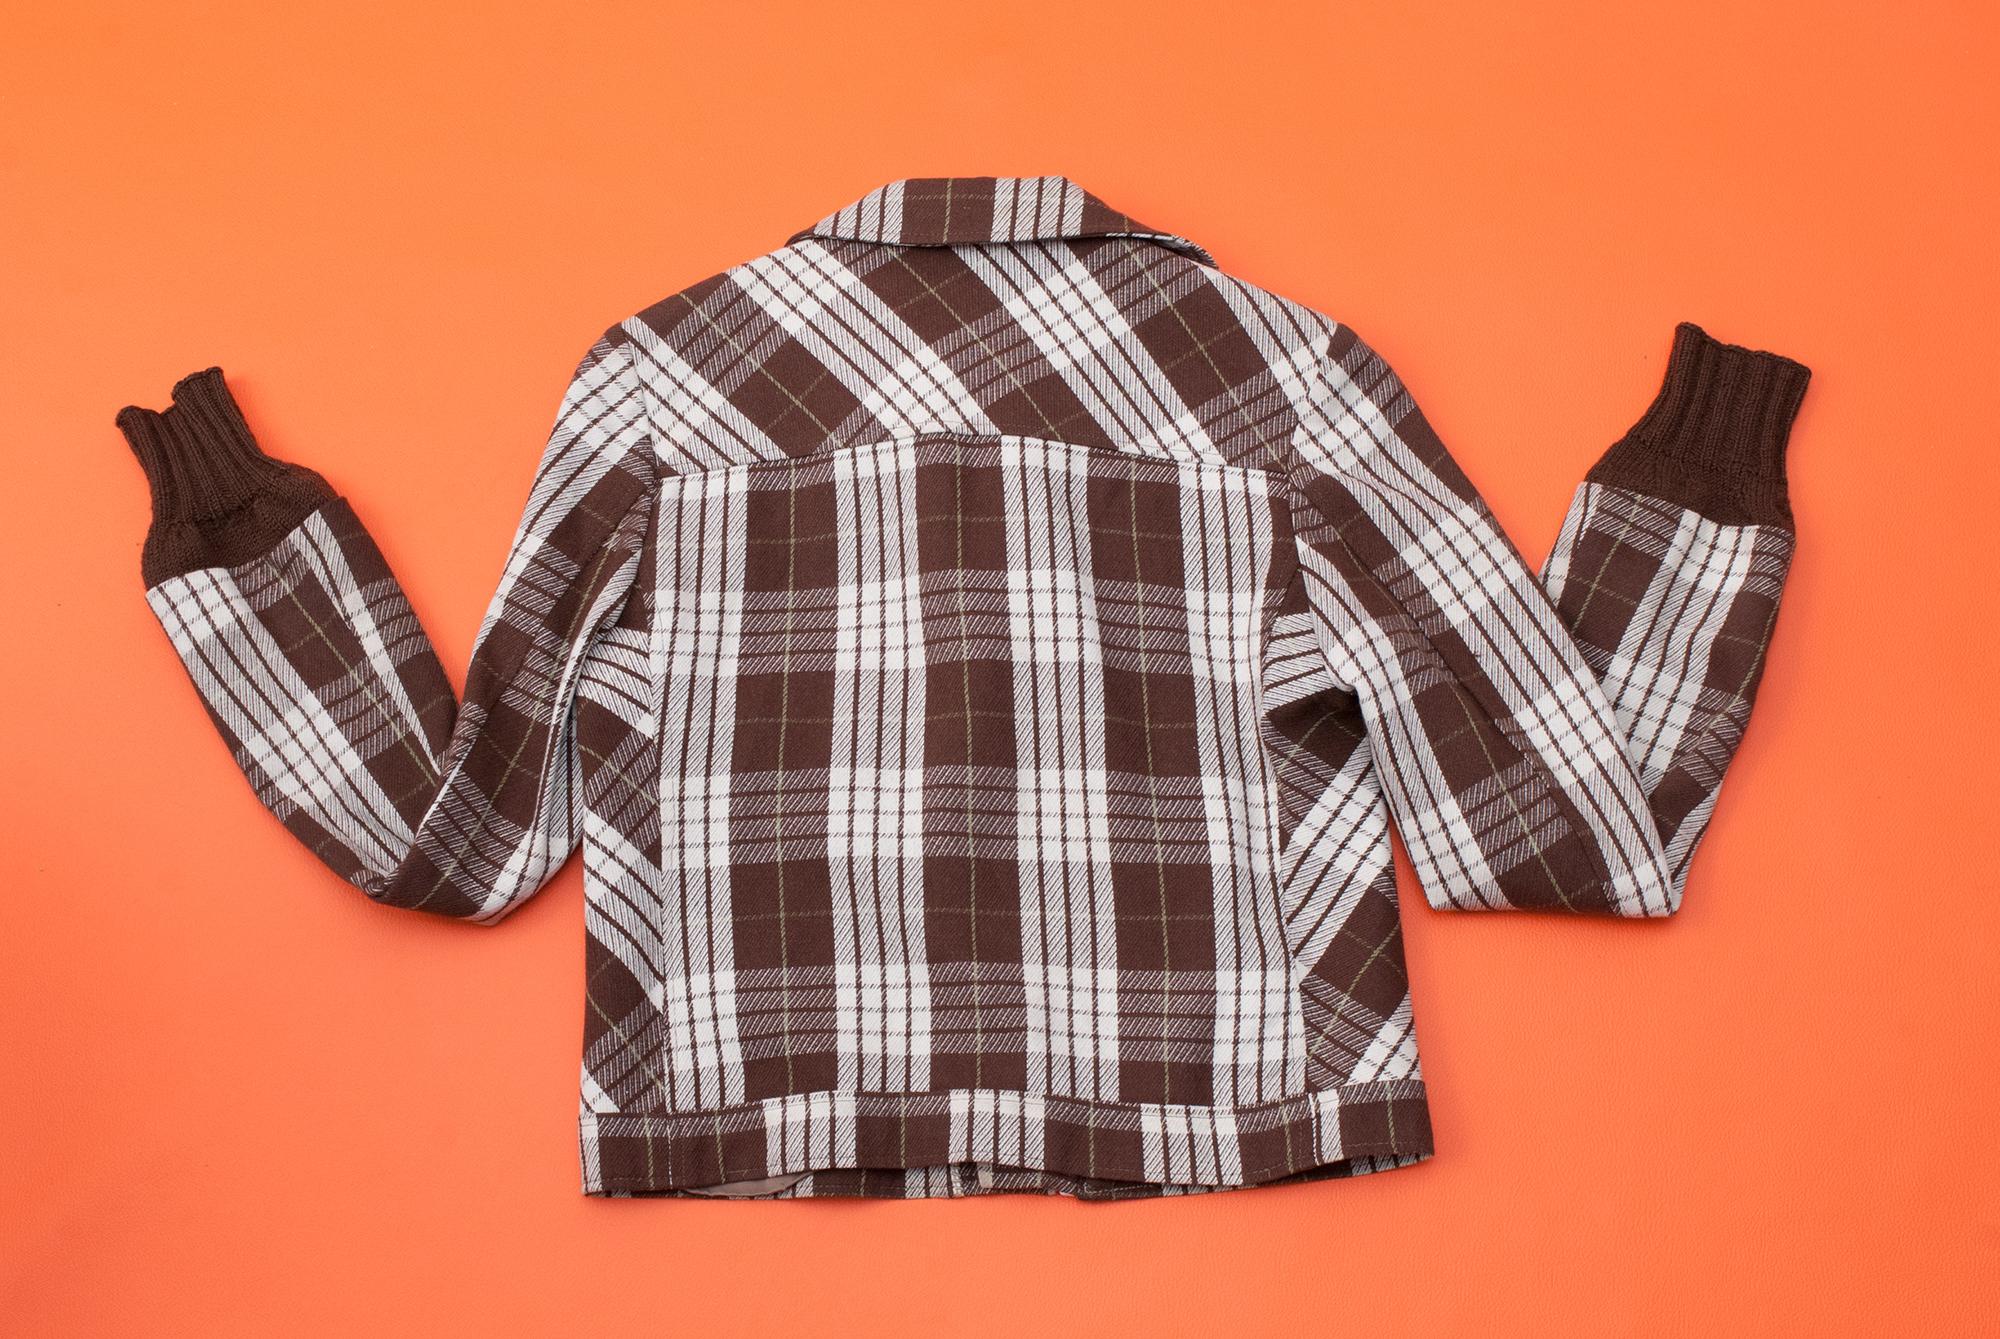 70's Motorcycle Style Jacket